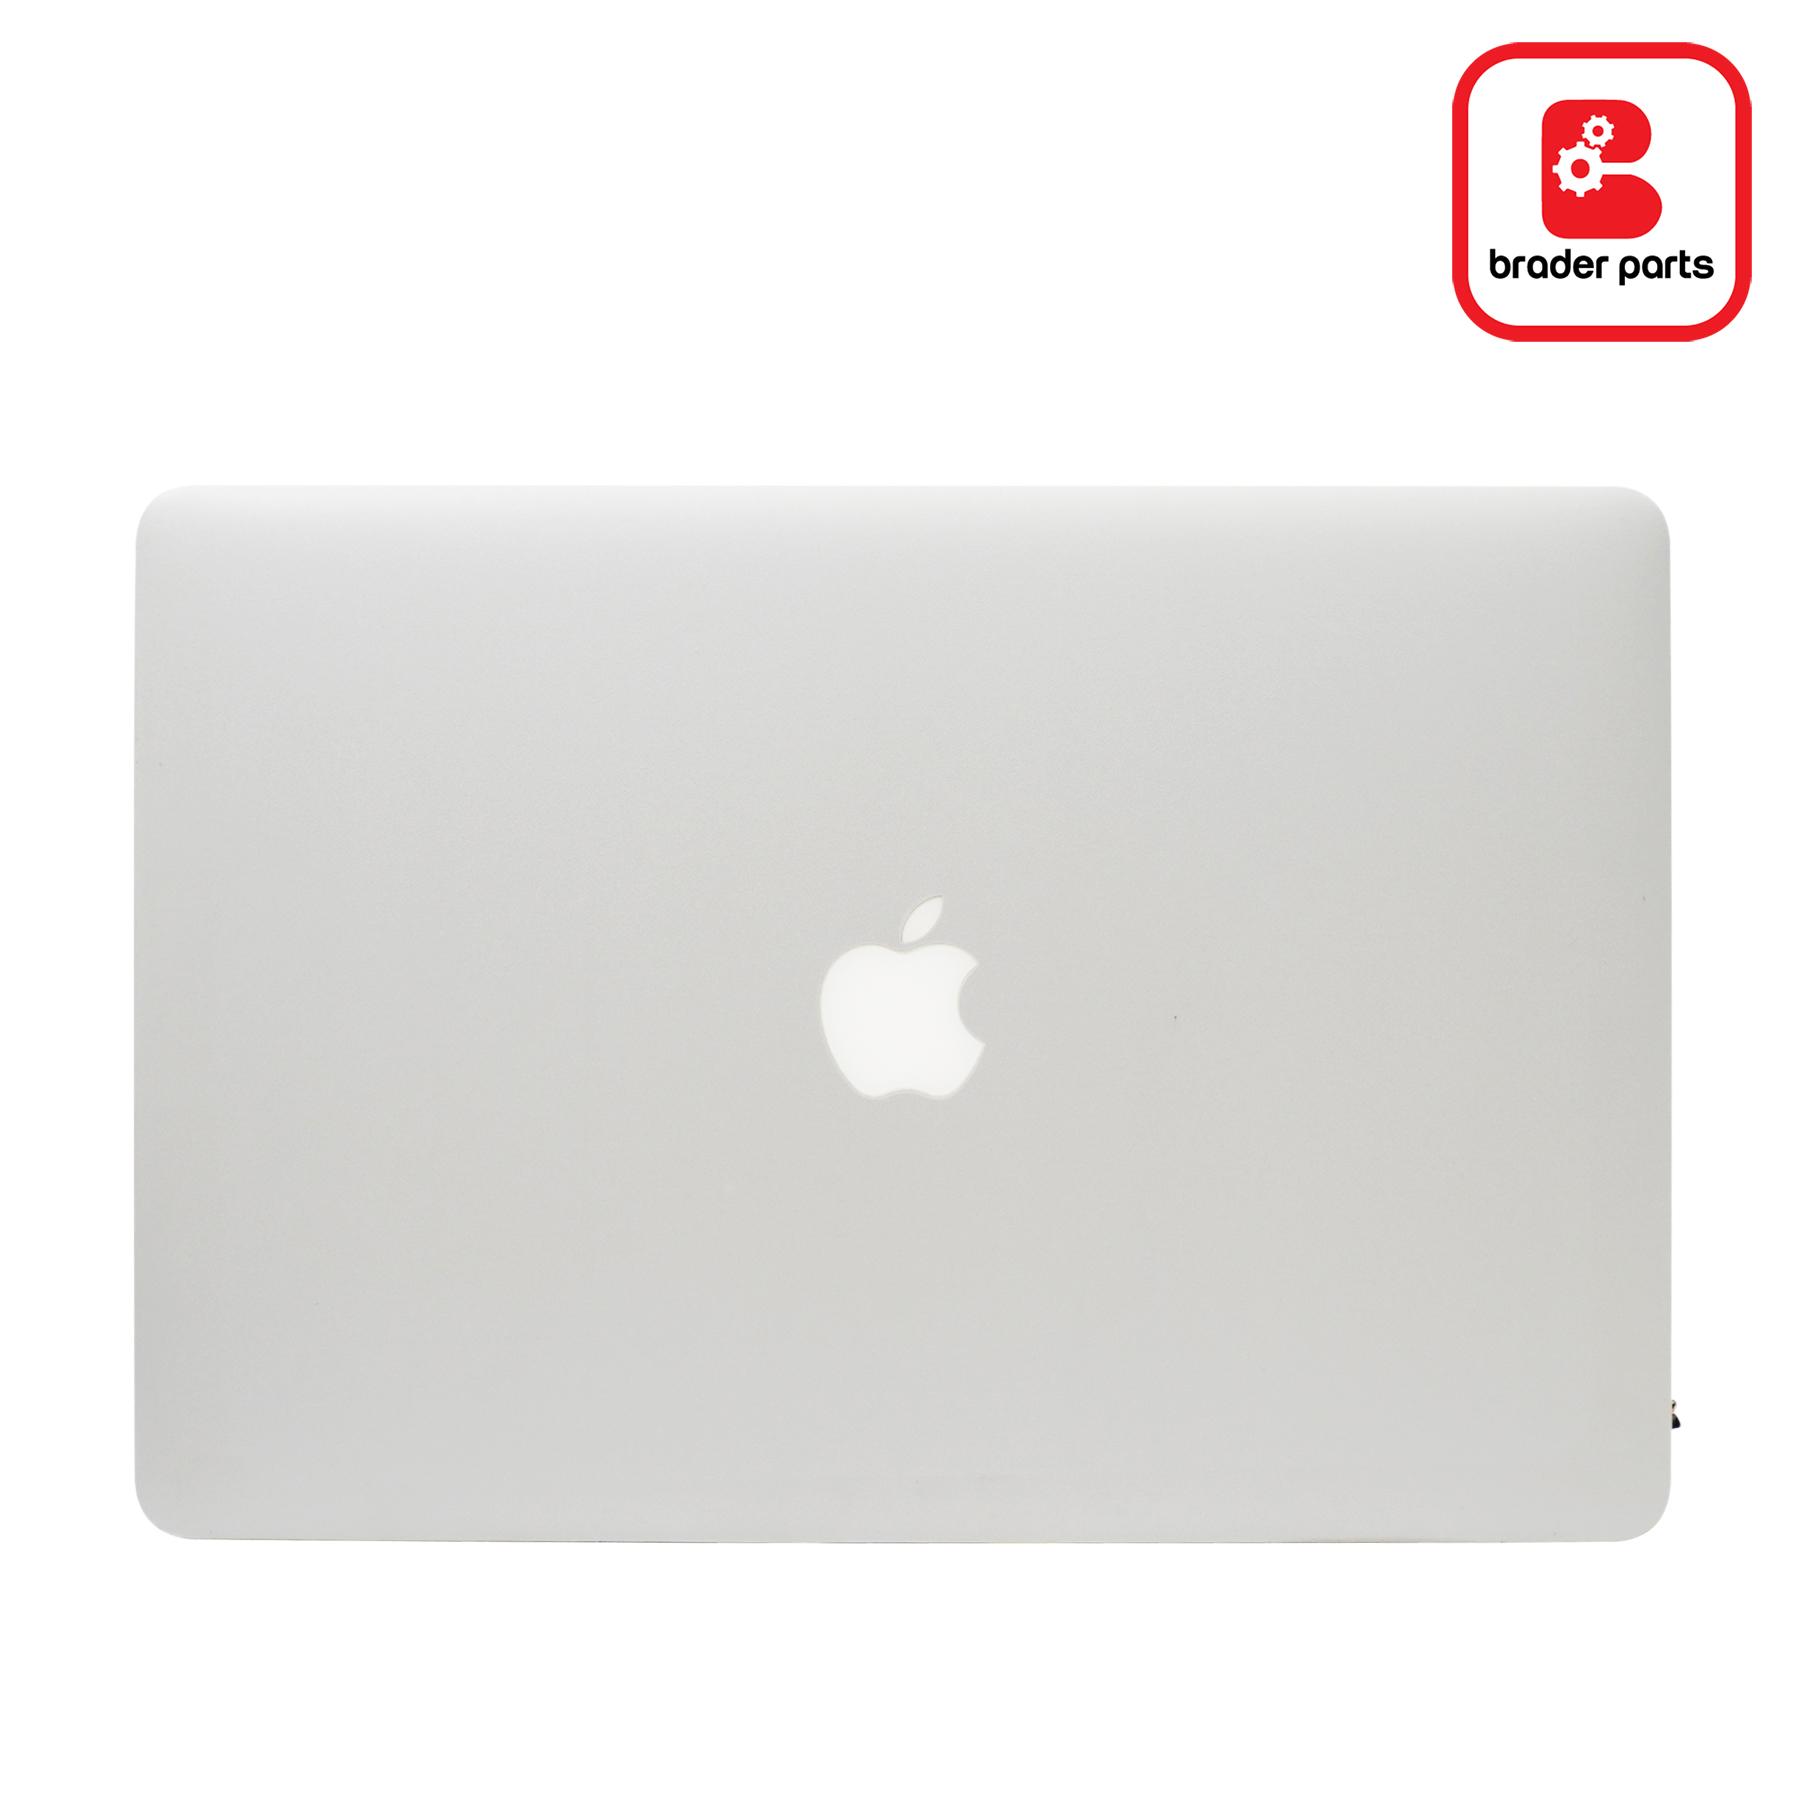 "Lcd Macbook Pro Retina 15"" A1398 MID 2015"